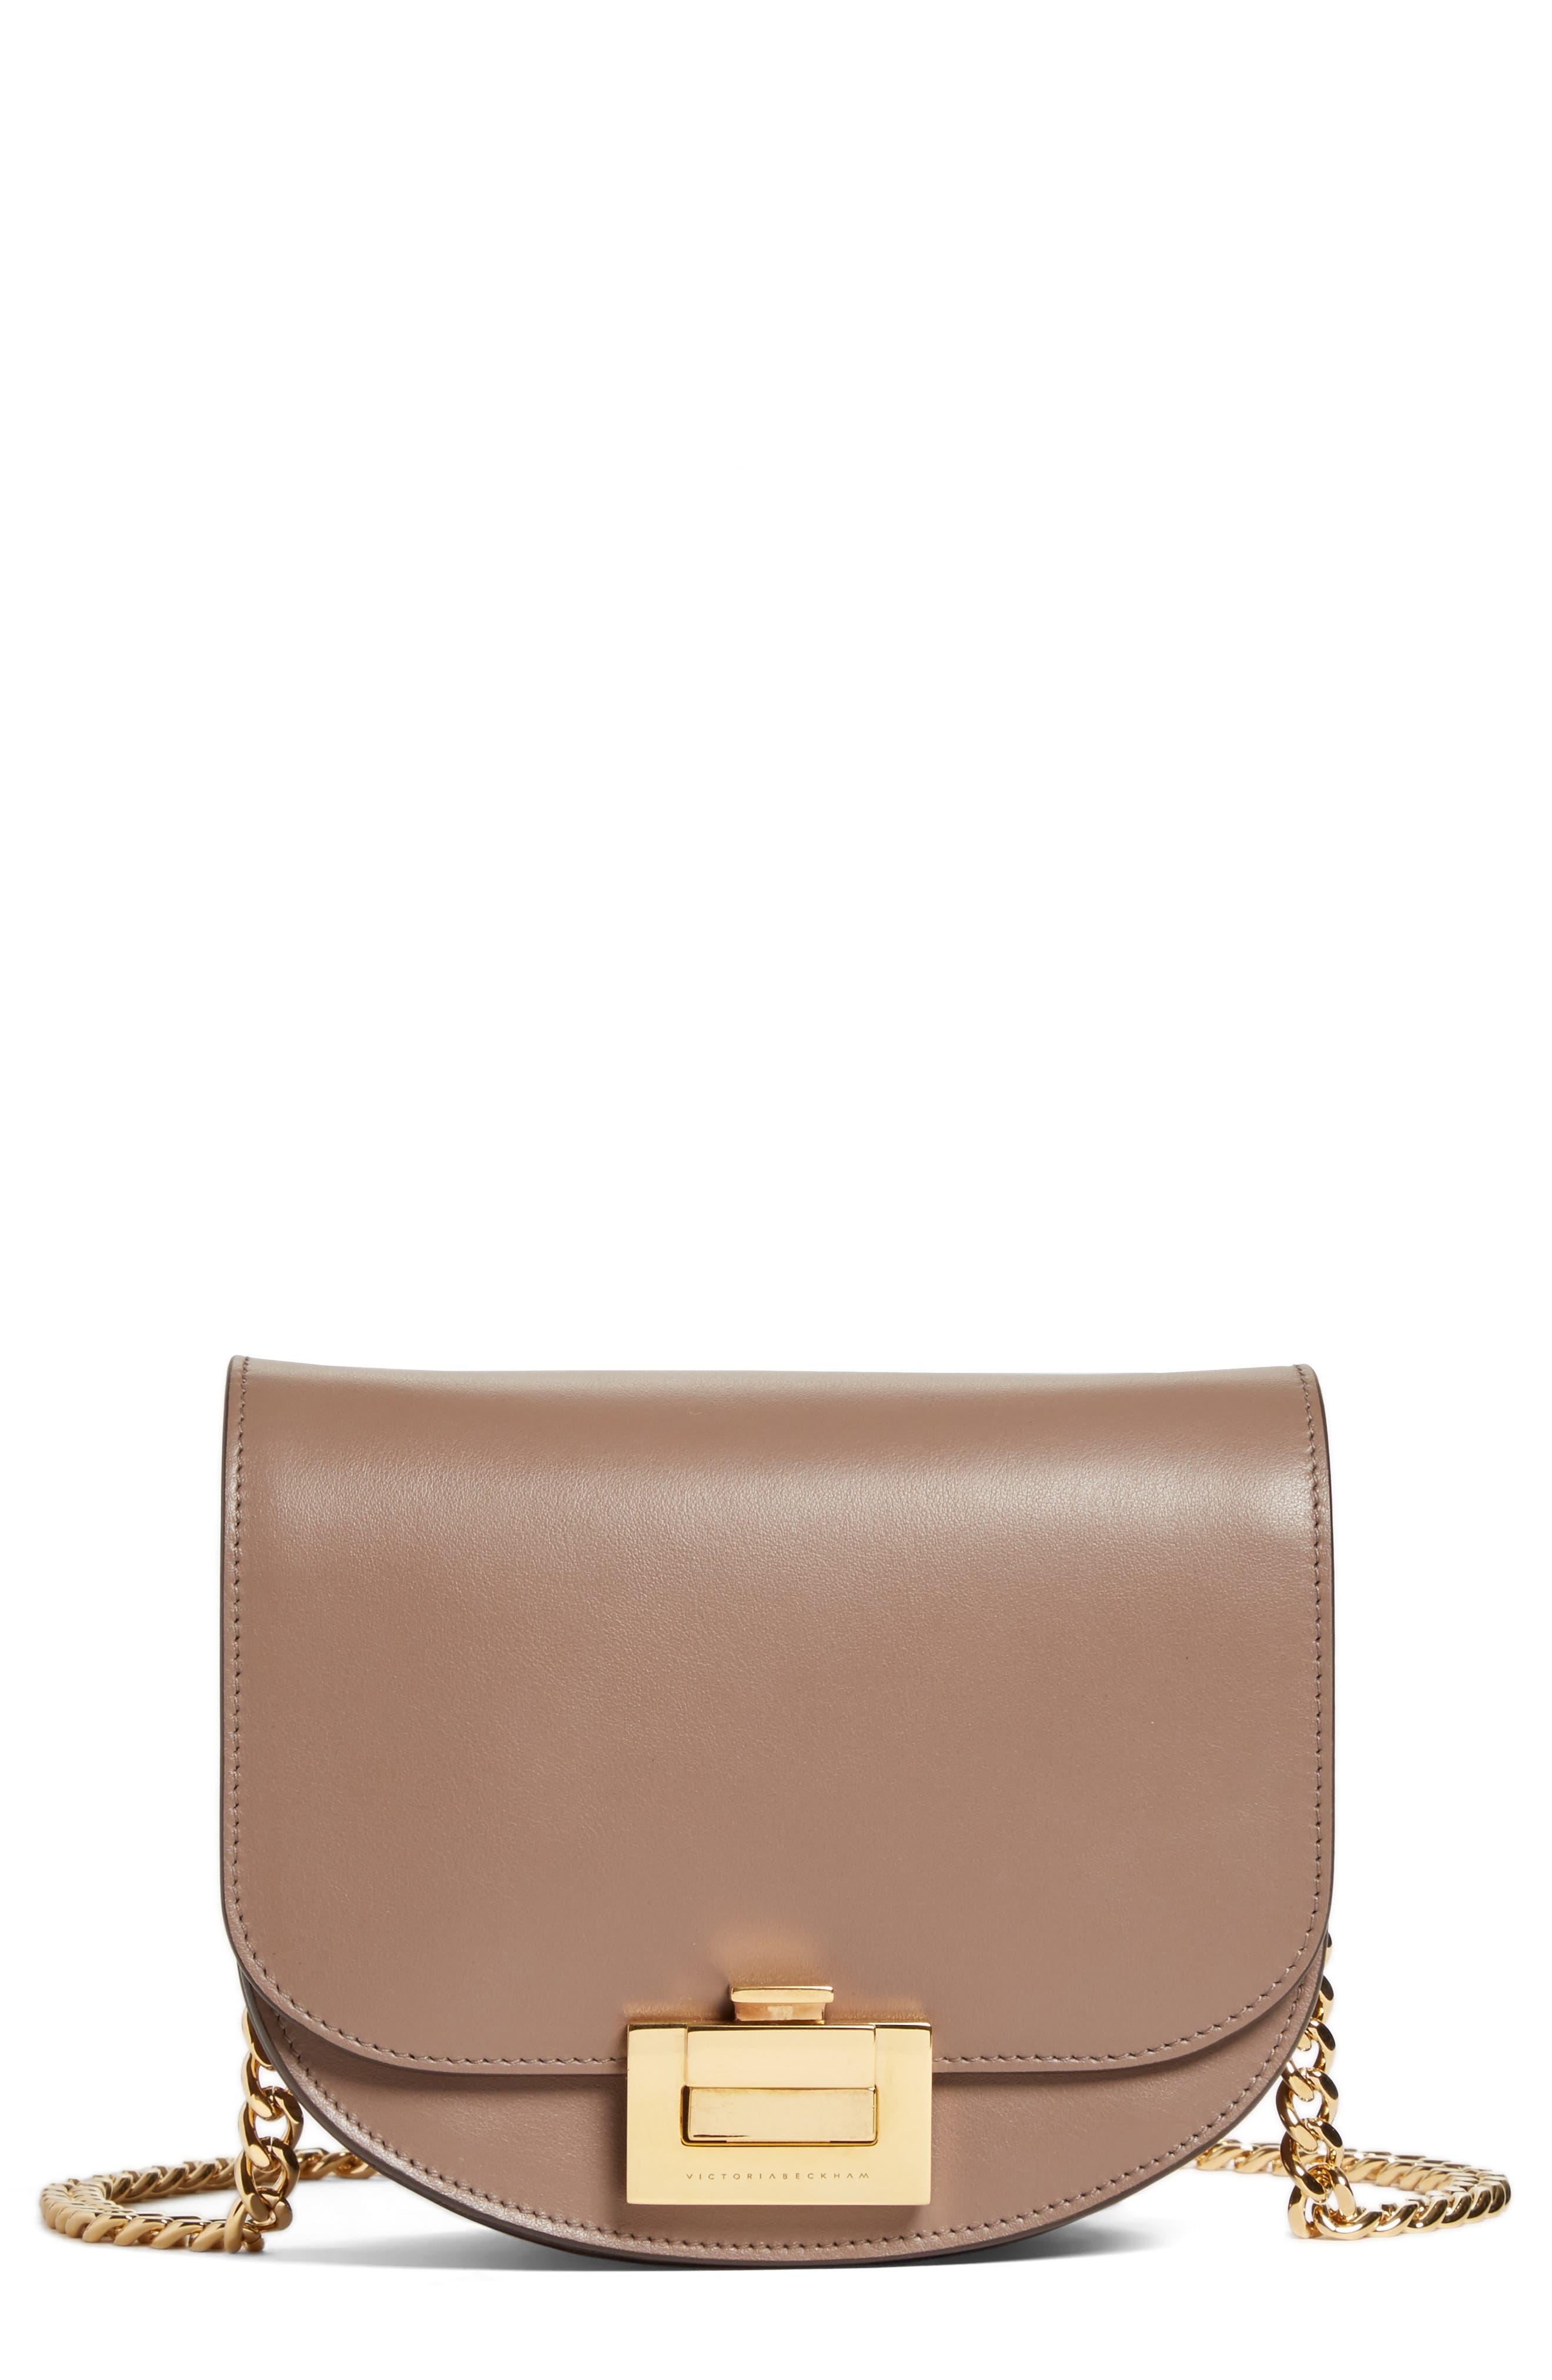 Medium Box Leather Shoulder Bag,                             Main thumbnail 1, color,                             200